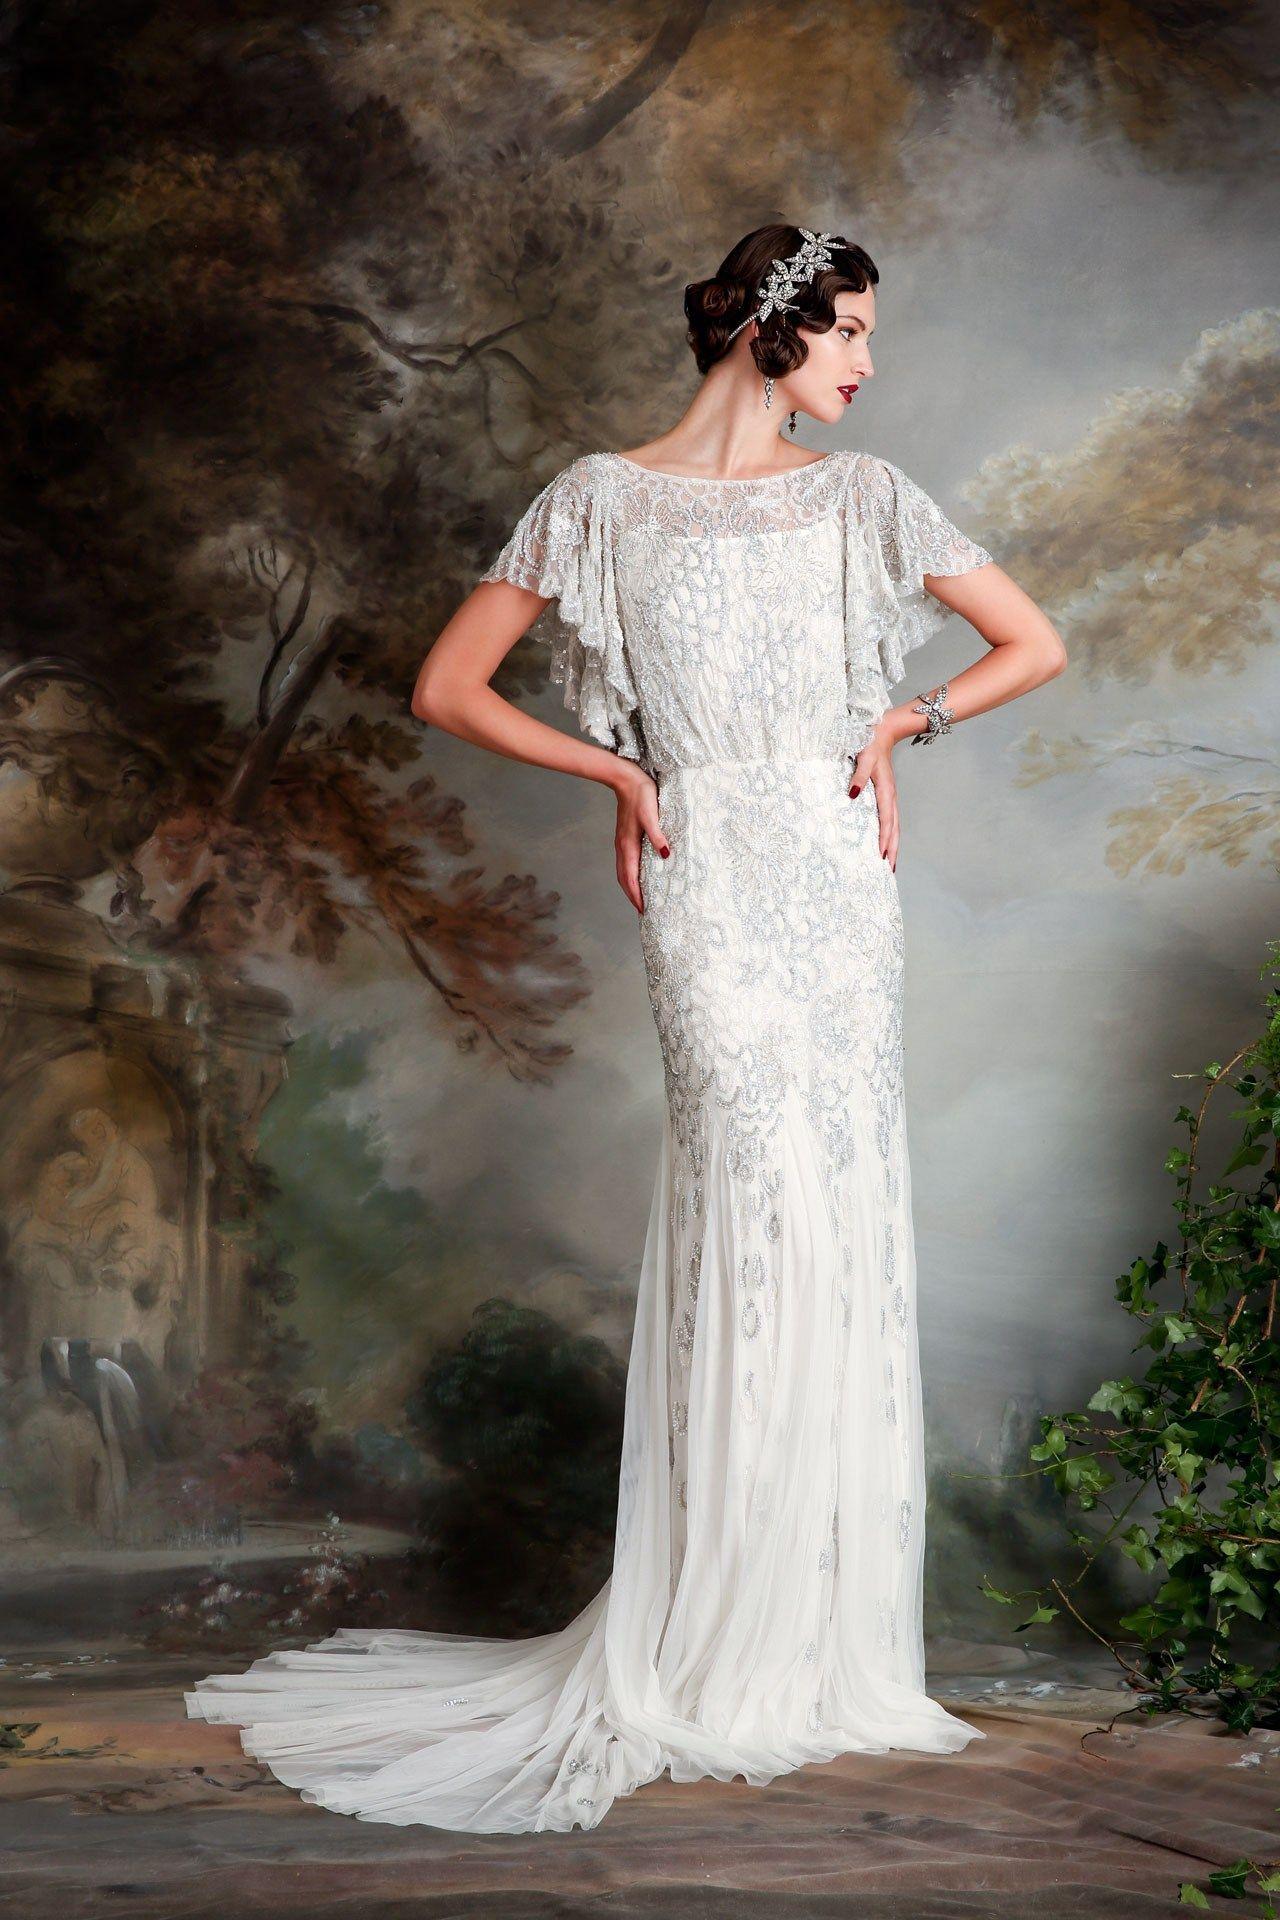 Wedding Dress Inspiration Ideas For Wedding Dresses Uk Wedding Gowns Bridesmagazine Co Foto De Vestidos Trajes De Novia Vintage Vestidos De Noche De Encaje